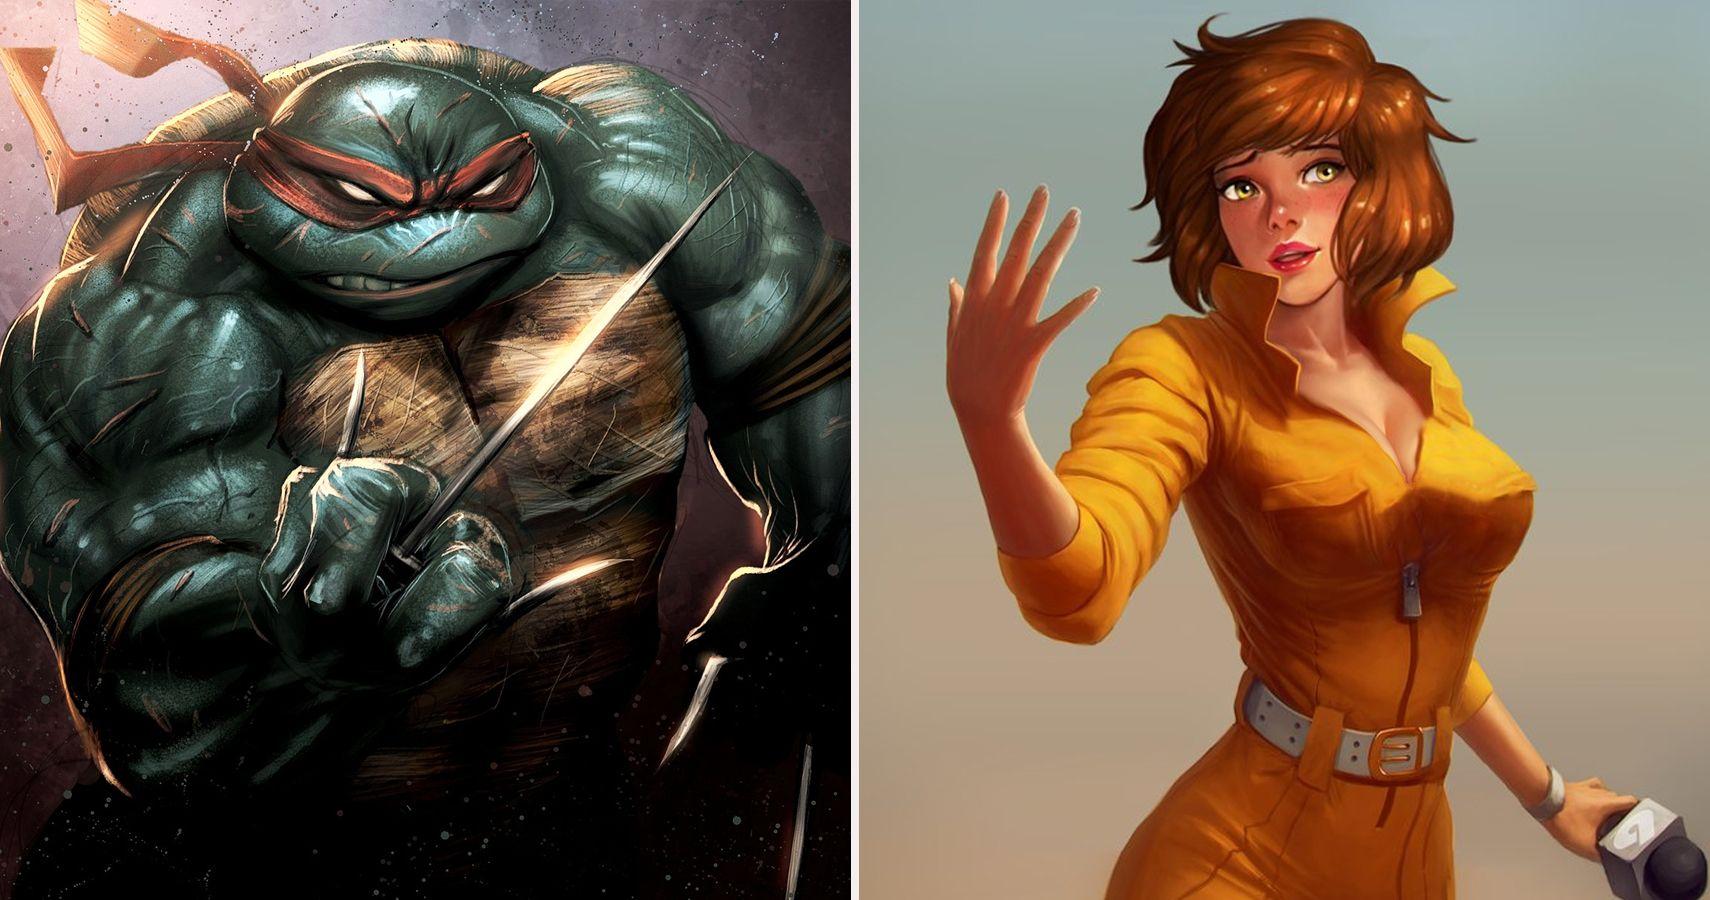 Half-Shell: Shockingly Dark Secrets About the Teenage Mutant Ninja